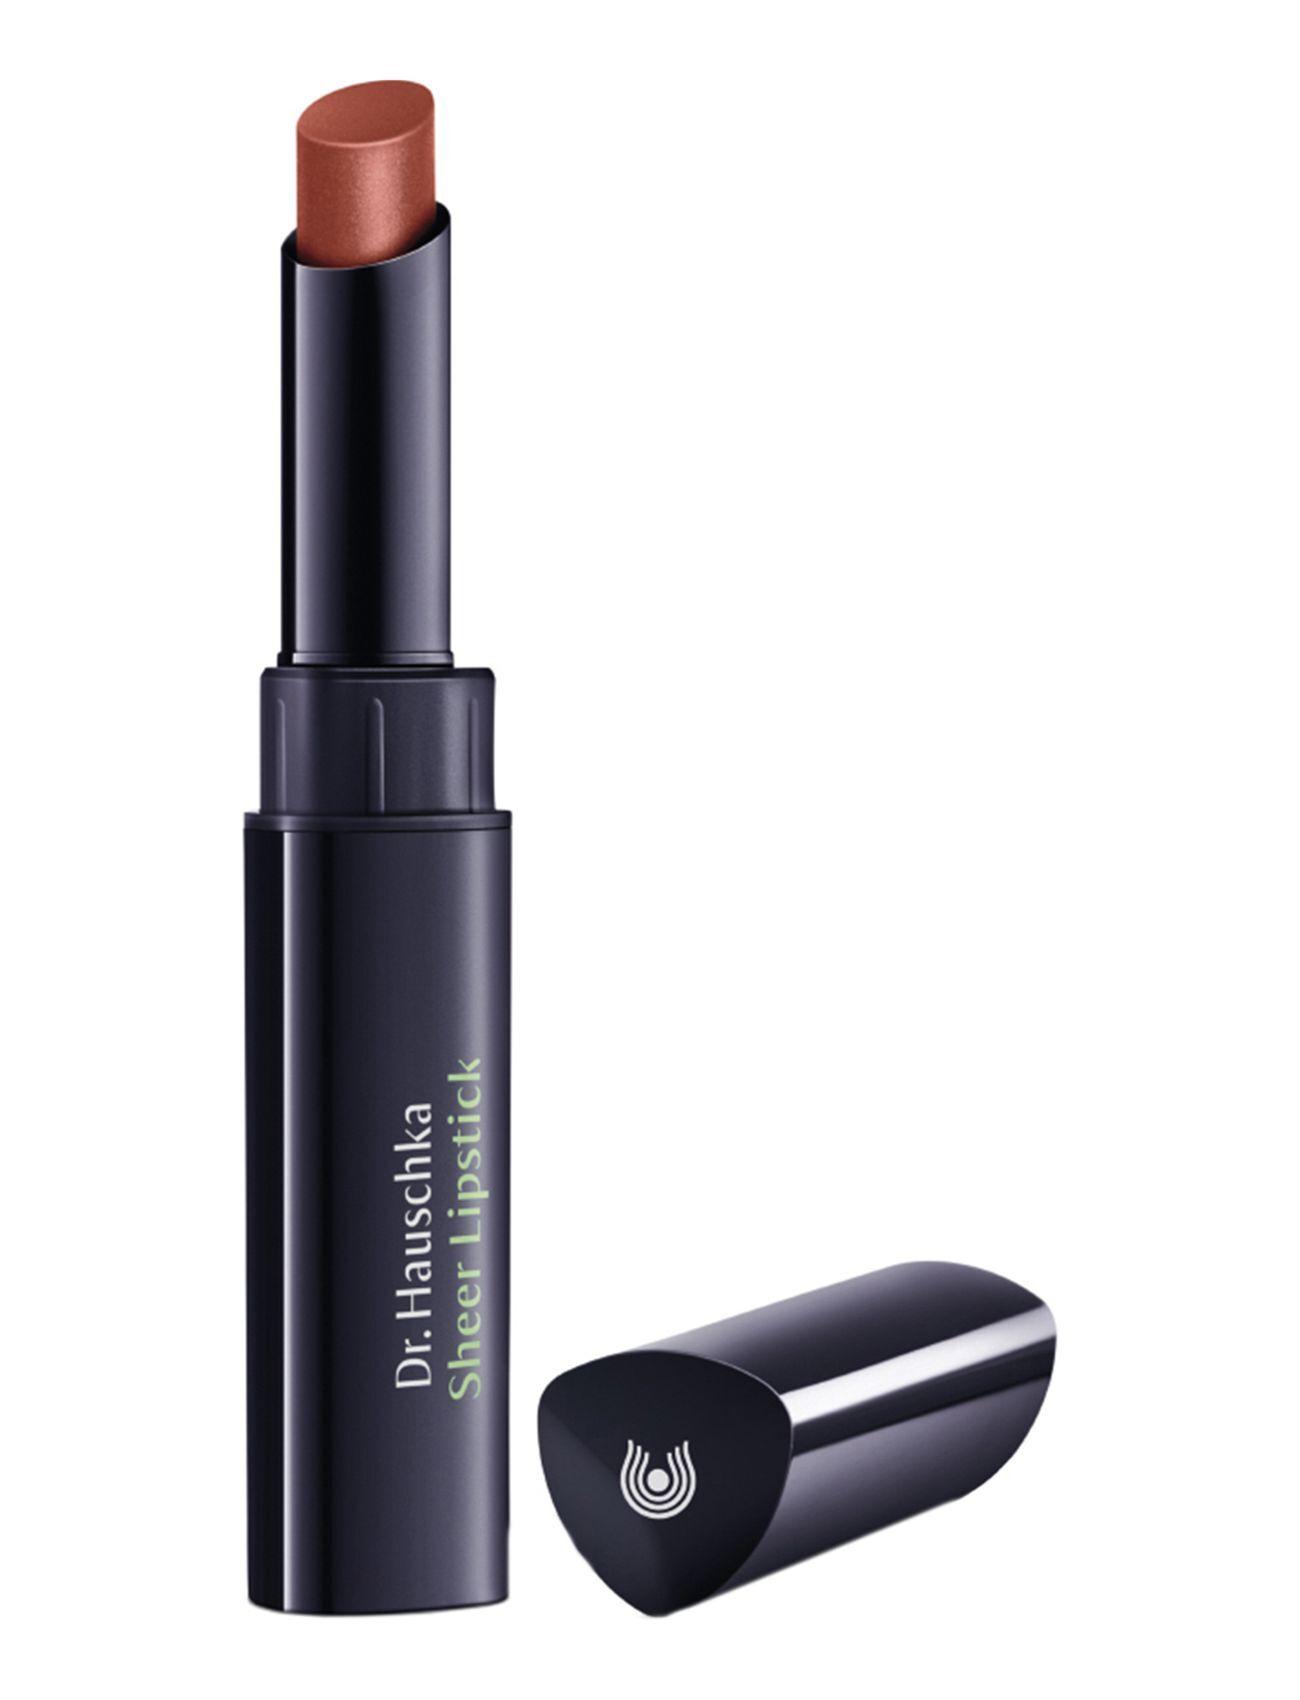 Dr. Hauschka Sheer Lipstick 06 Aprikola